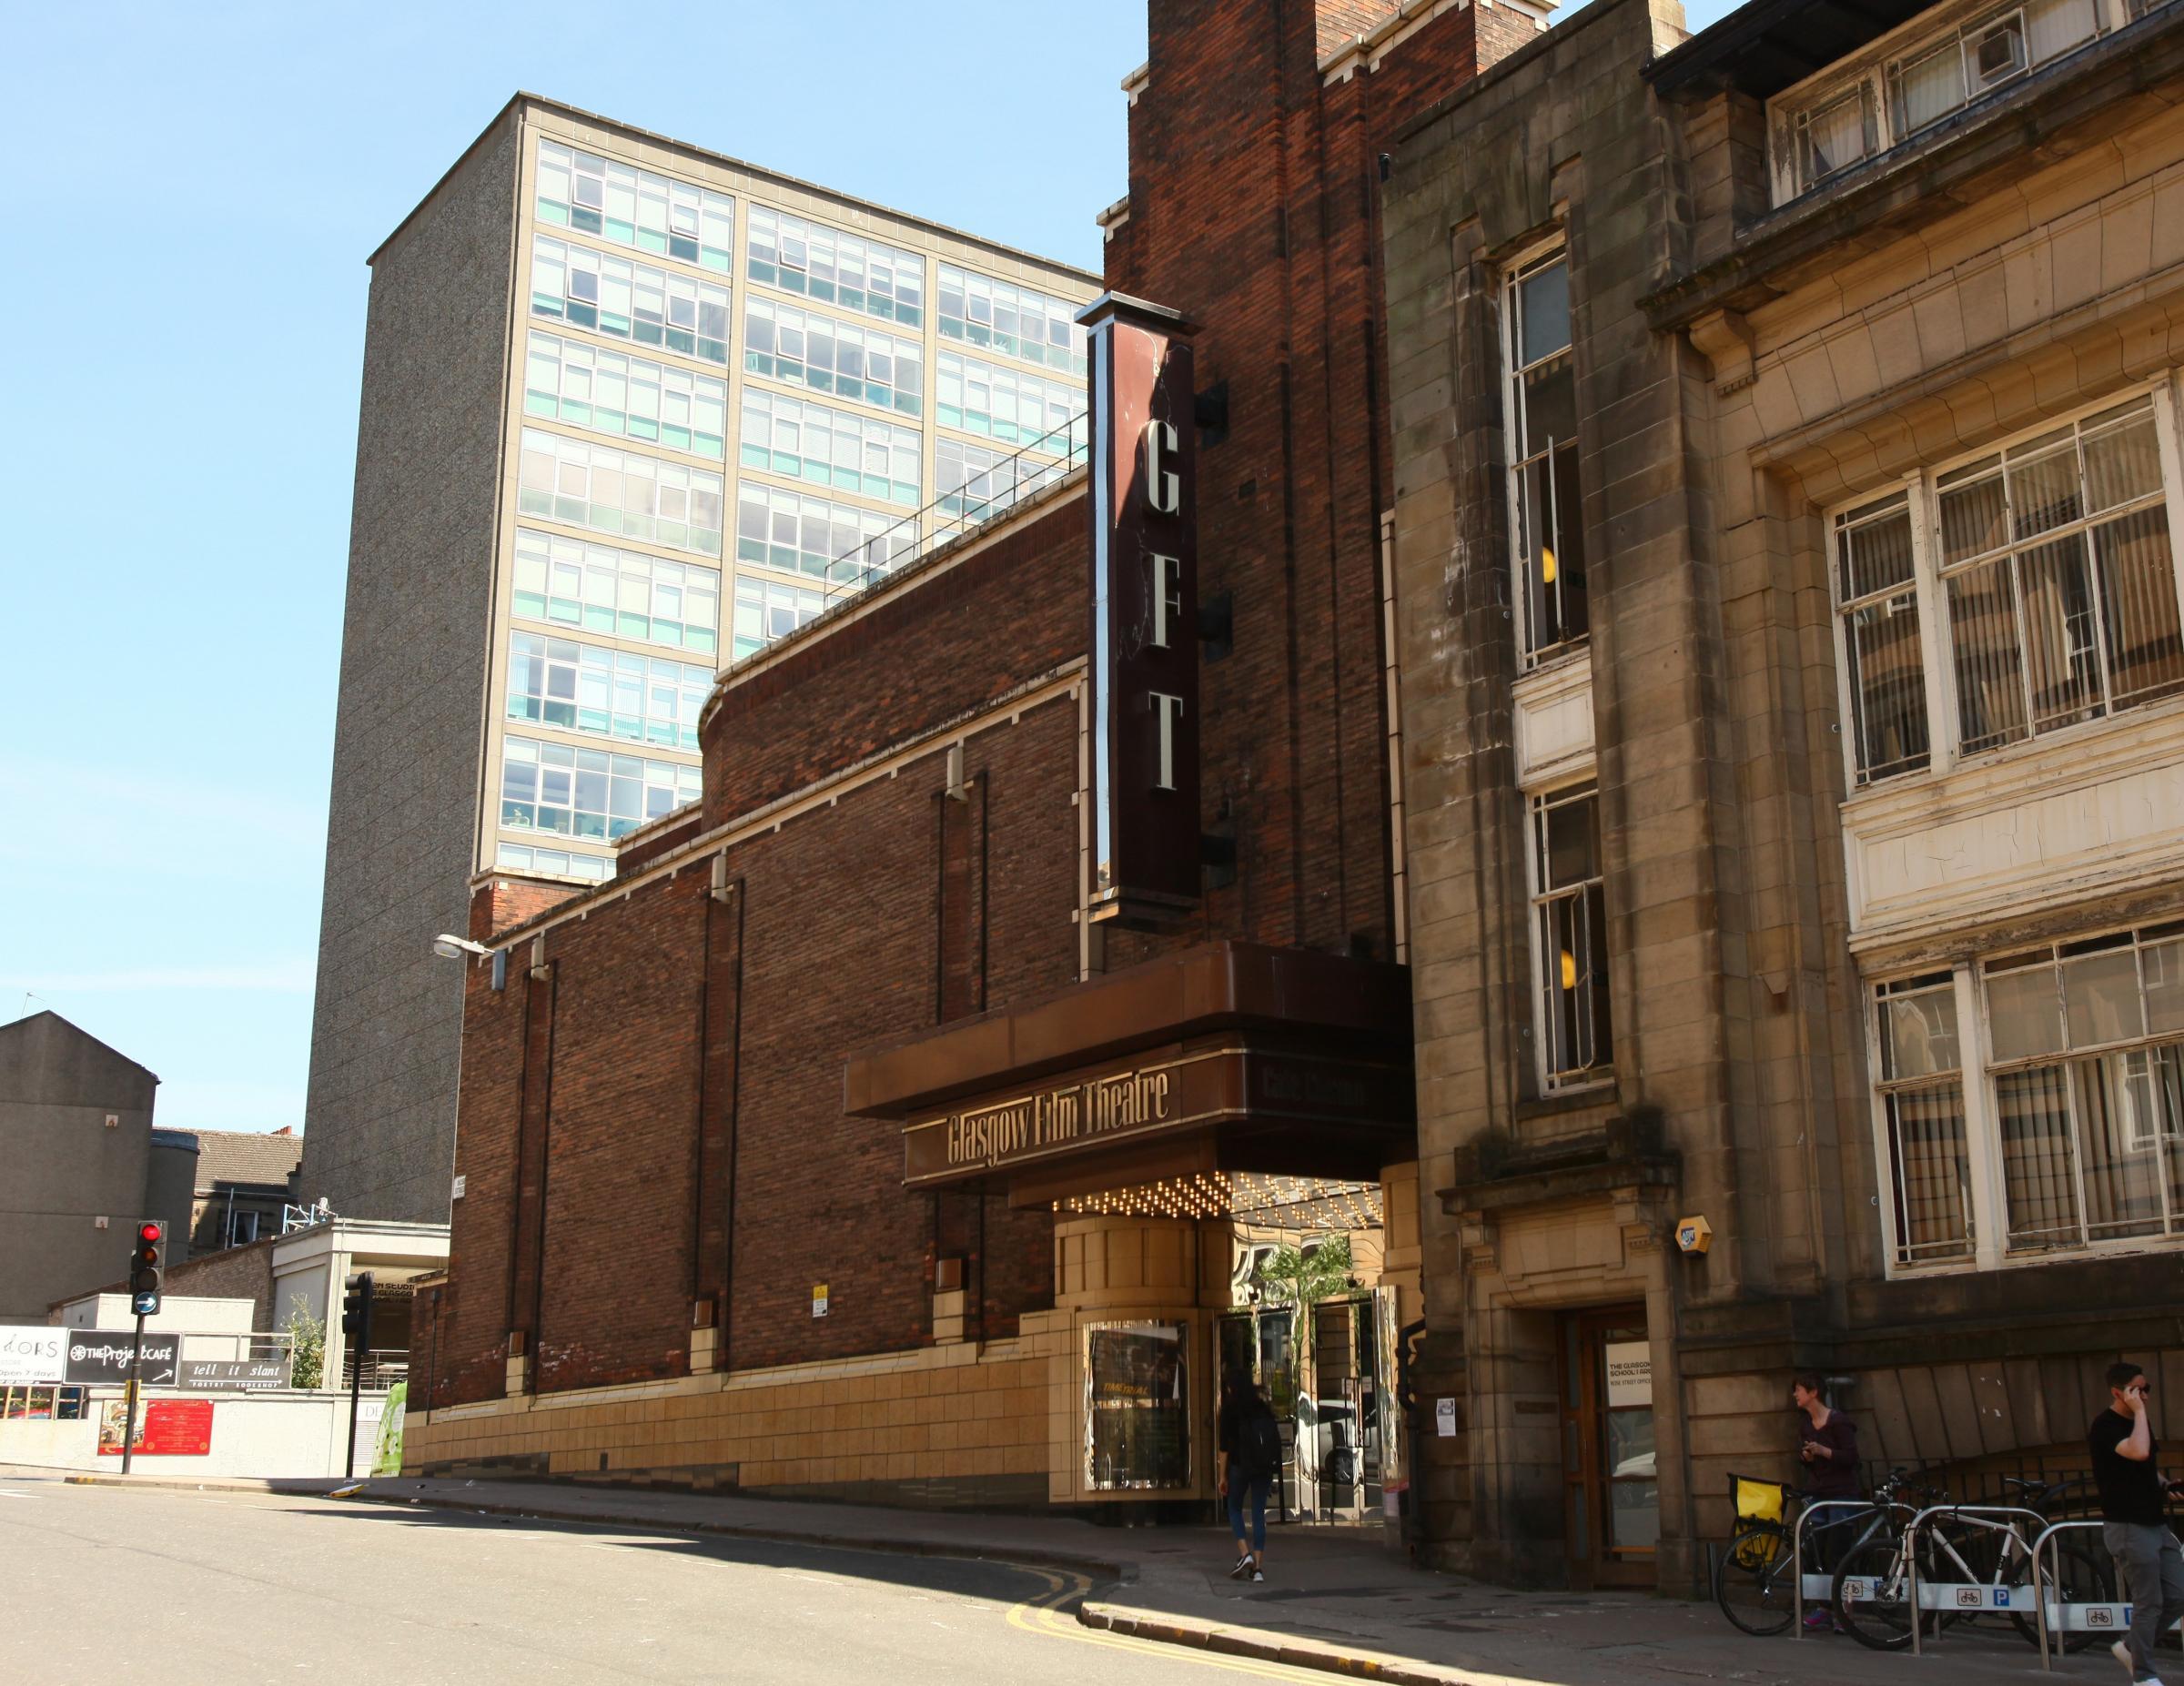 Glasgow Film Theatre named in list of best UK cinemas